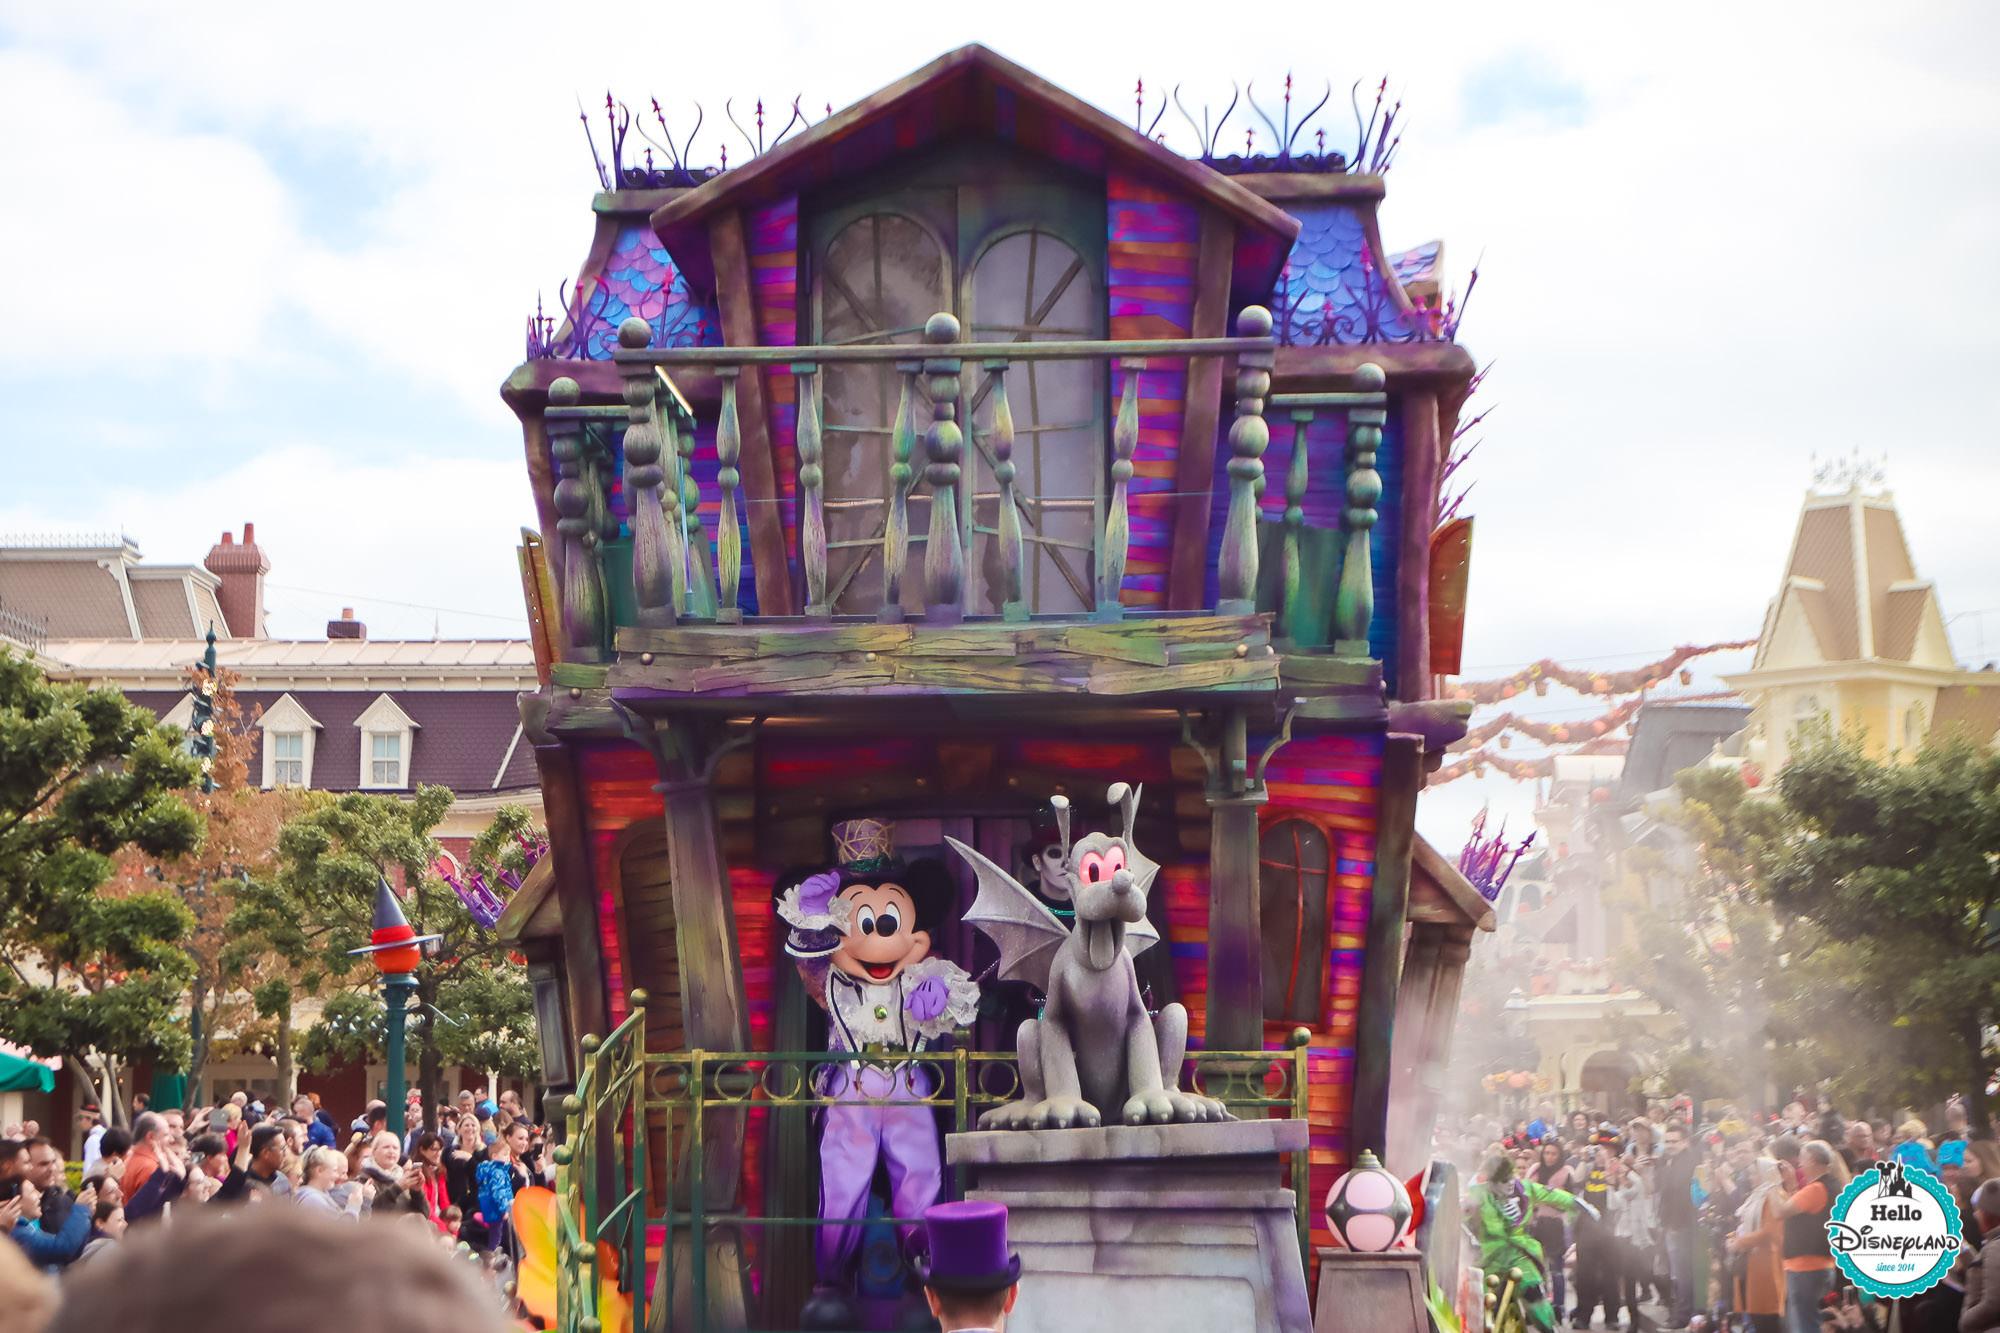 À Disneyland Top Hello D'halloween 2018 10 Paris gbf6yY7